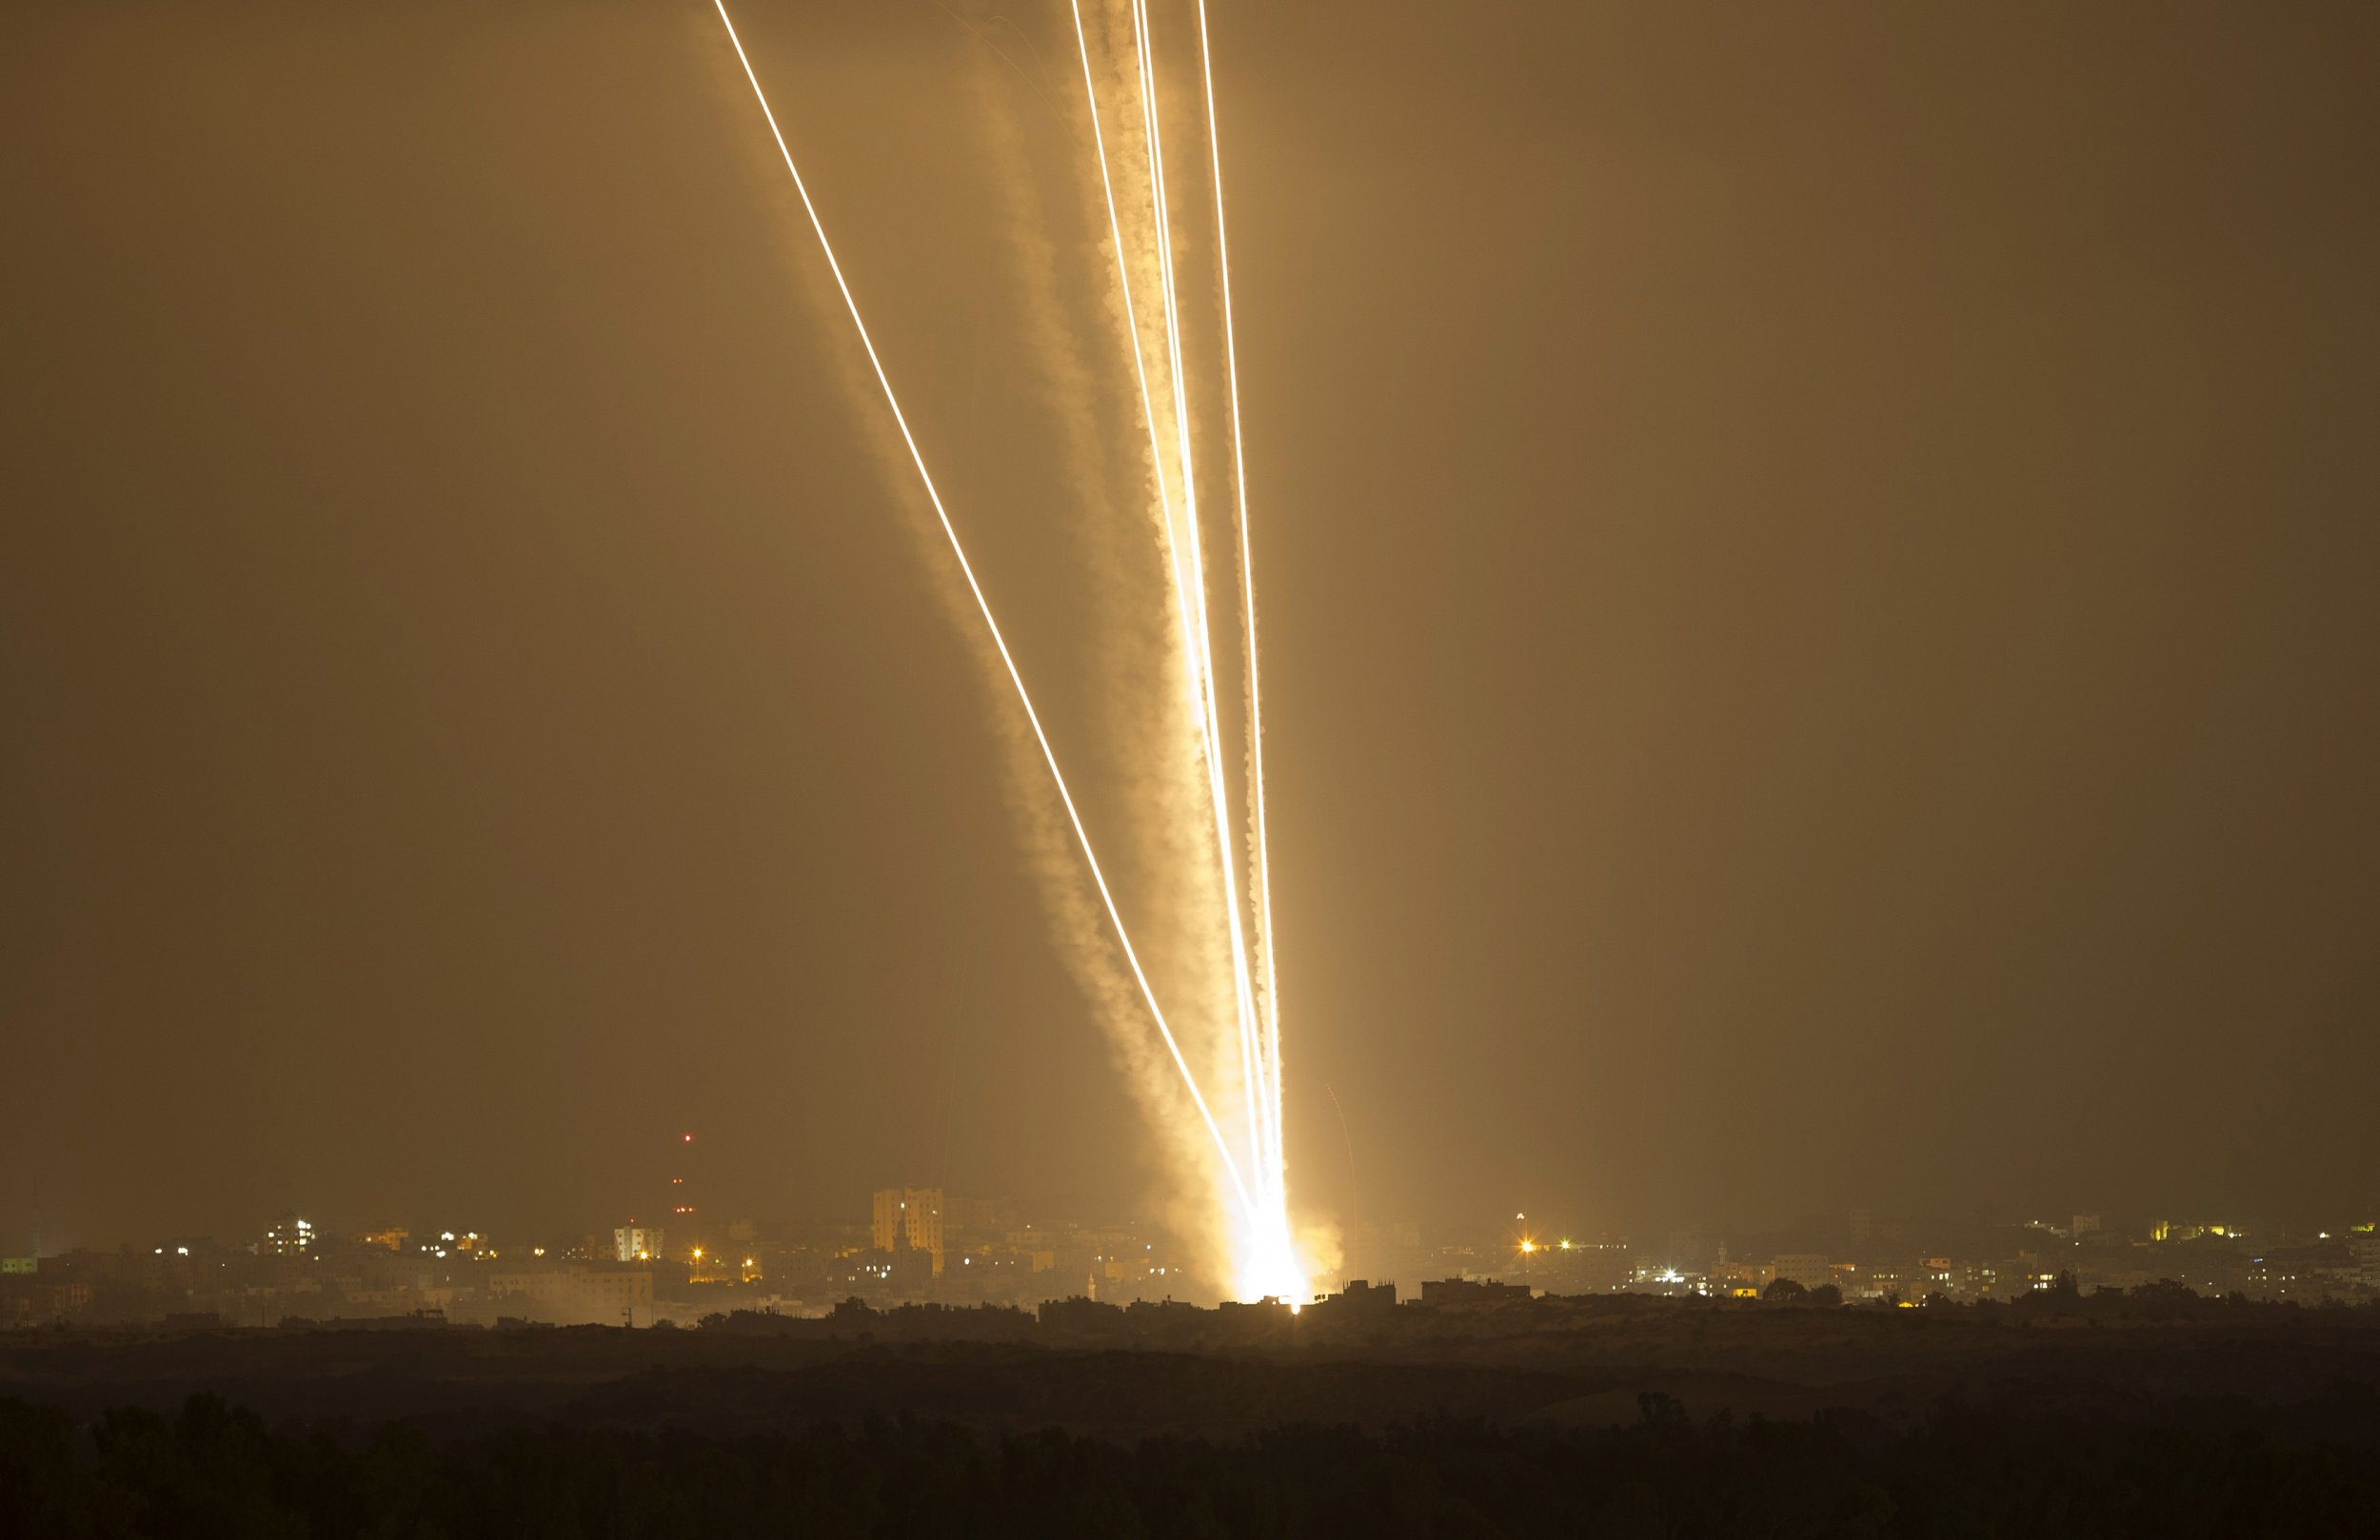 2014-07-23T194330Z_1_LYNXMPEA6M0WA_RTROPTP_4_PALESTINIANS-ISRAEL (1)